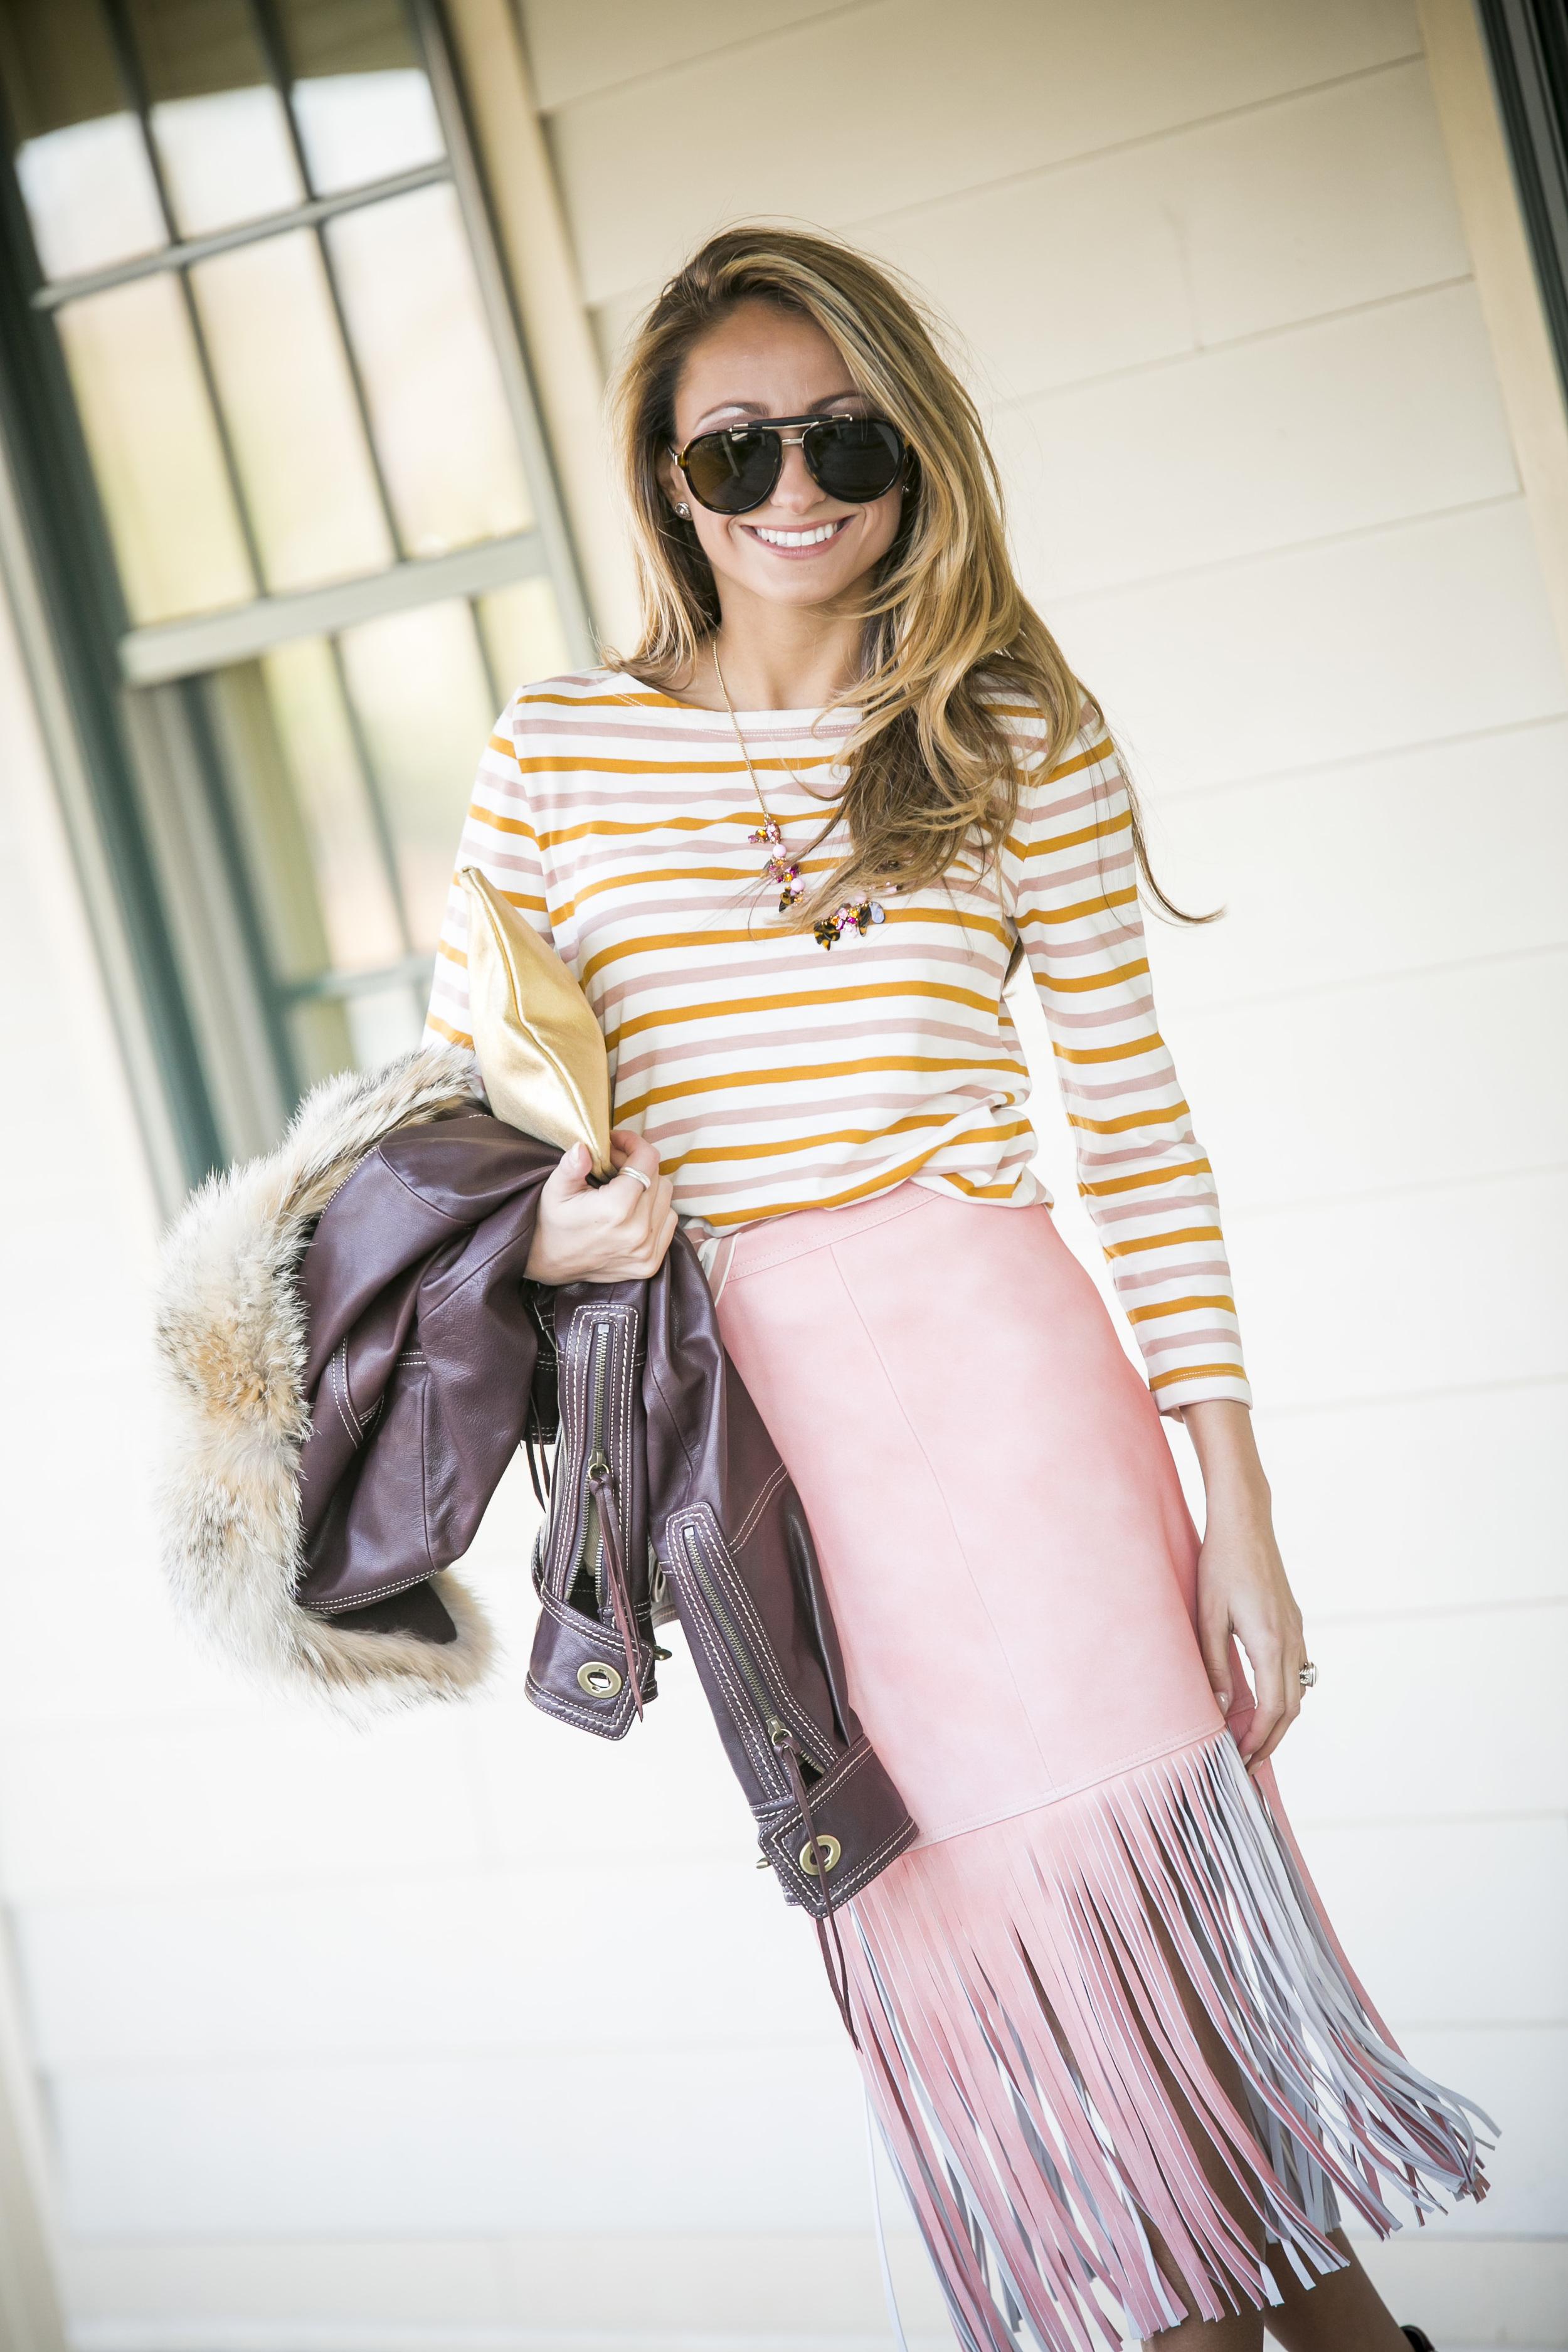 J.Crew stripes and J.Crew skirt